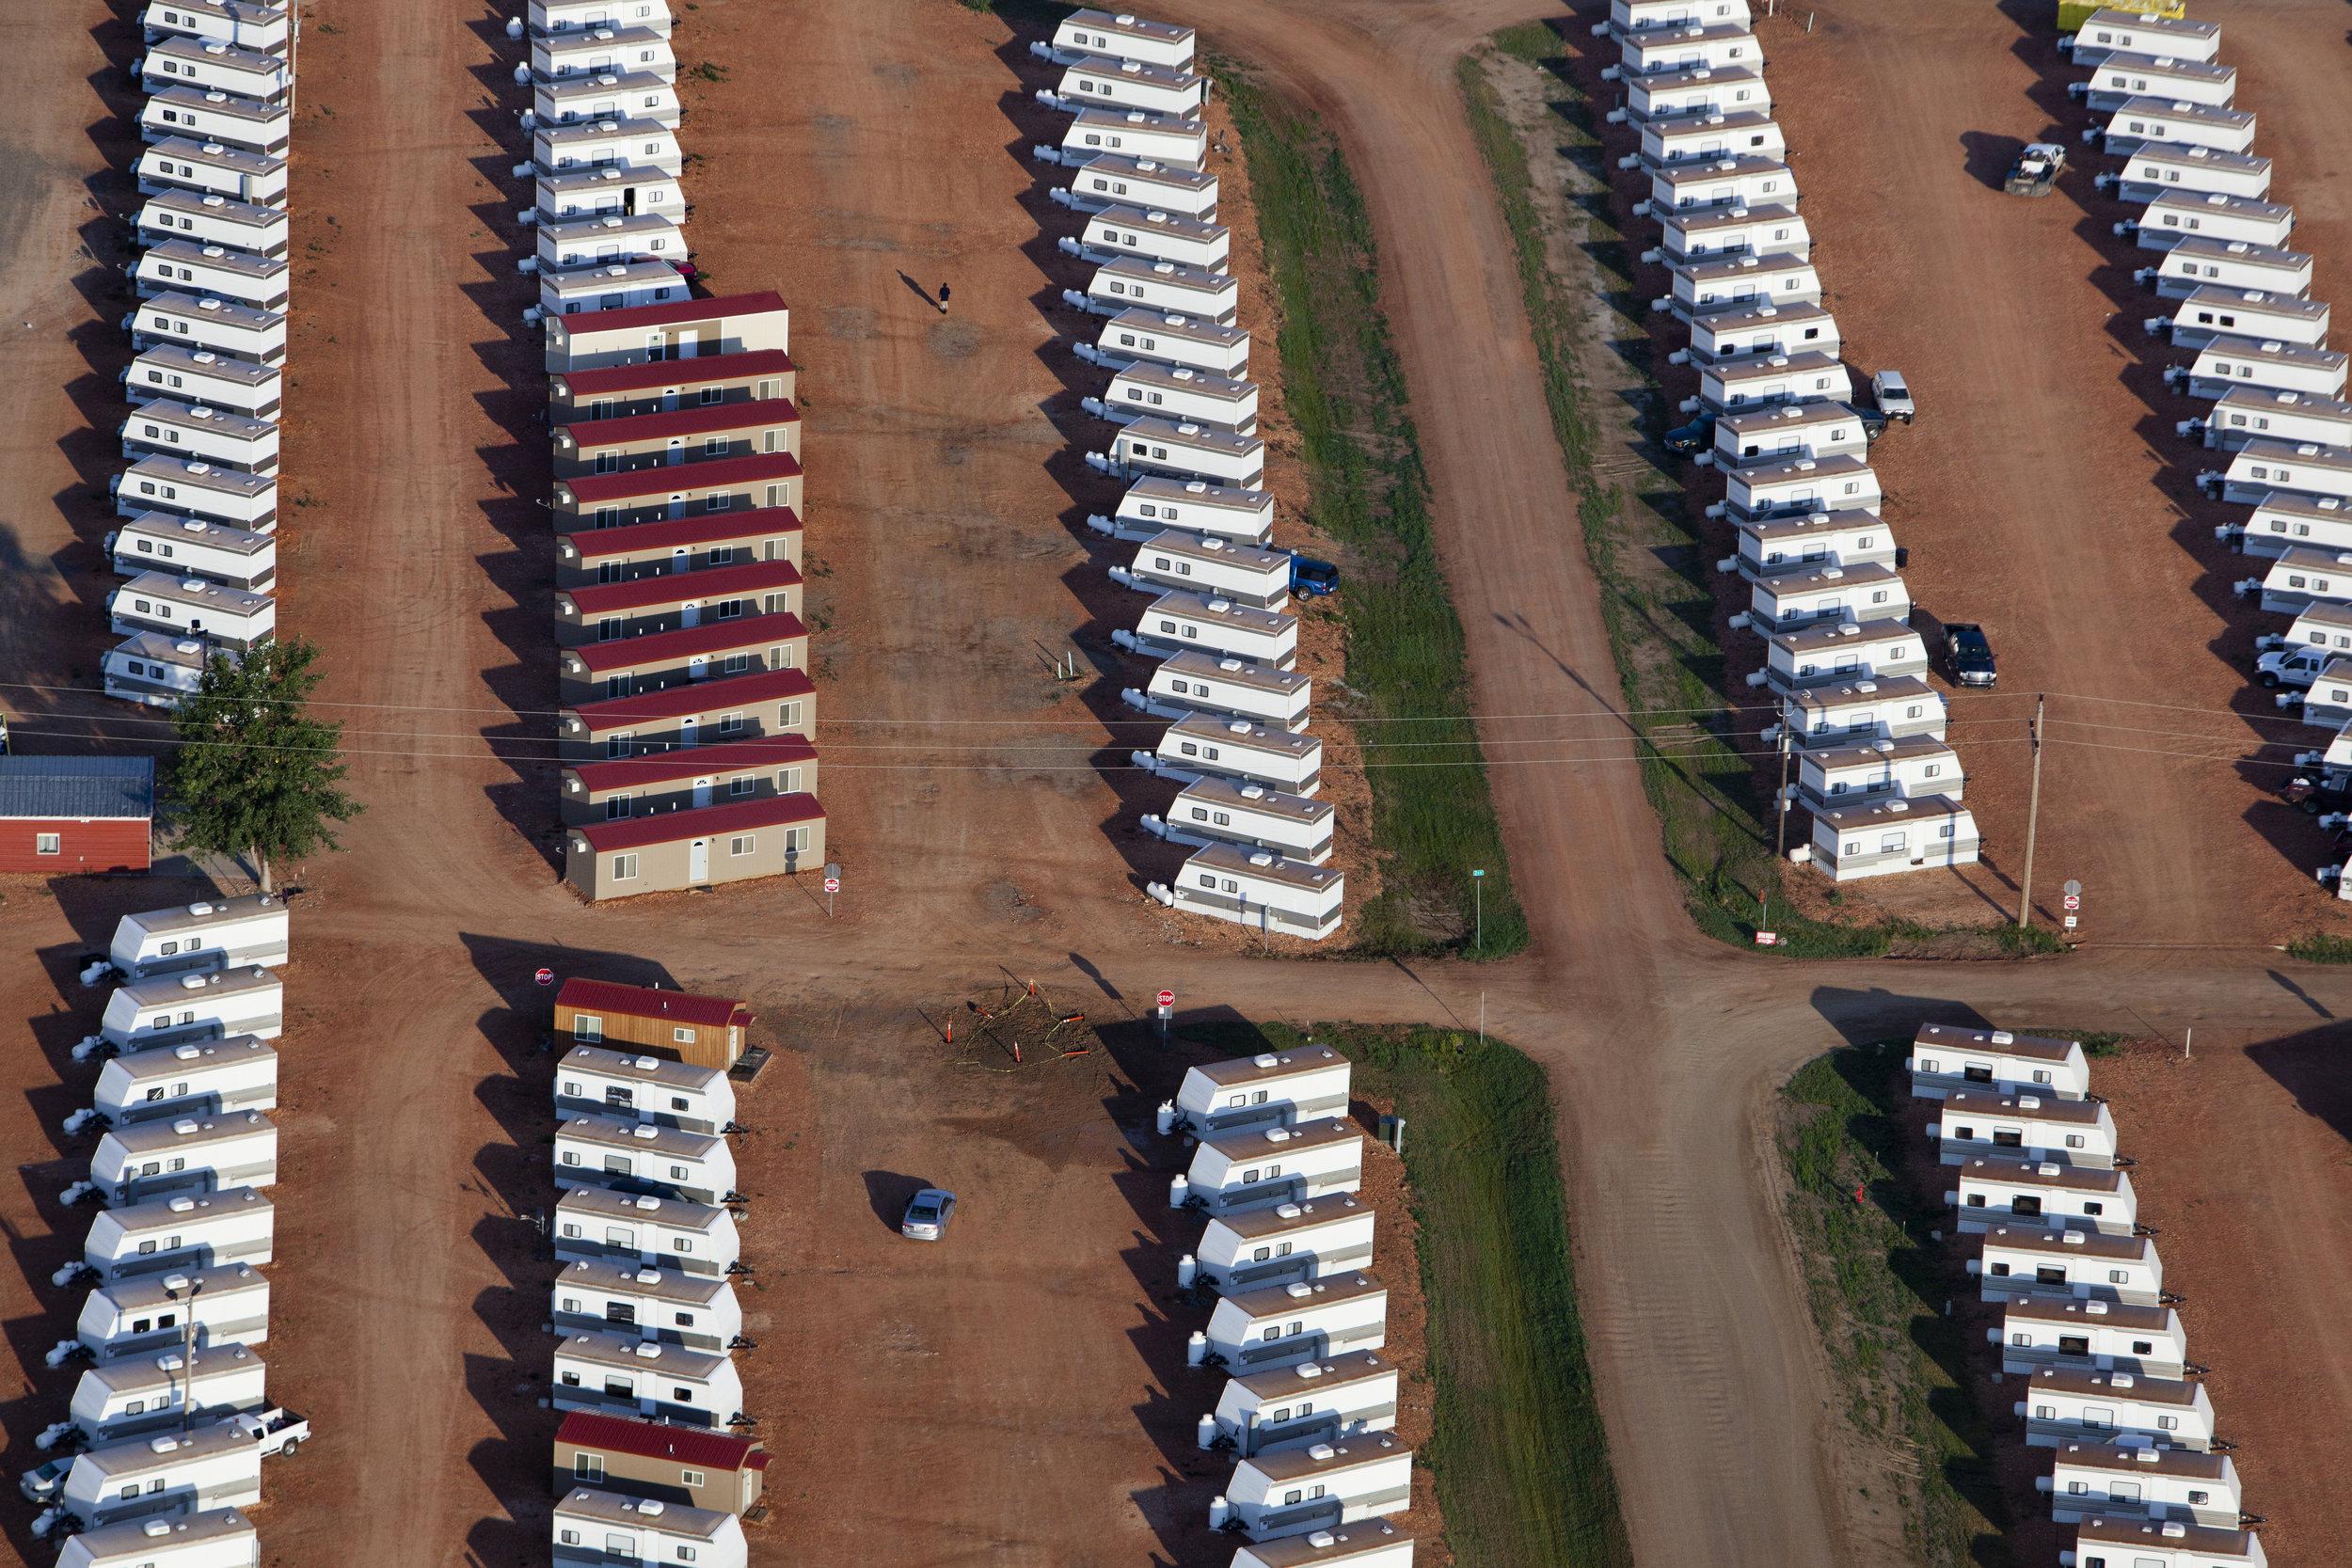 Oil boom, Williston, North Dakota